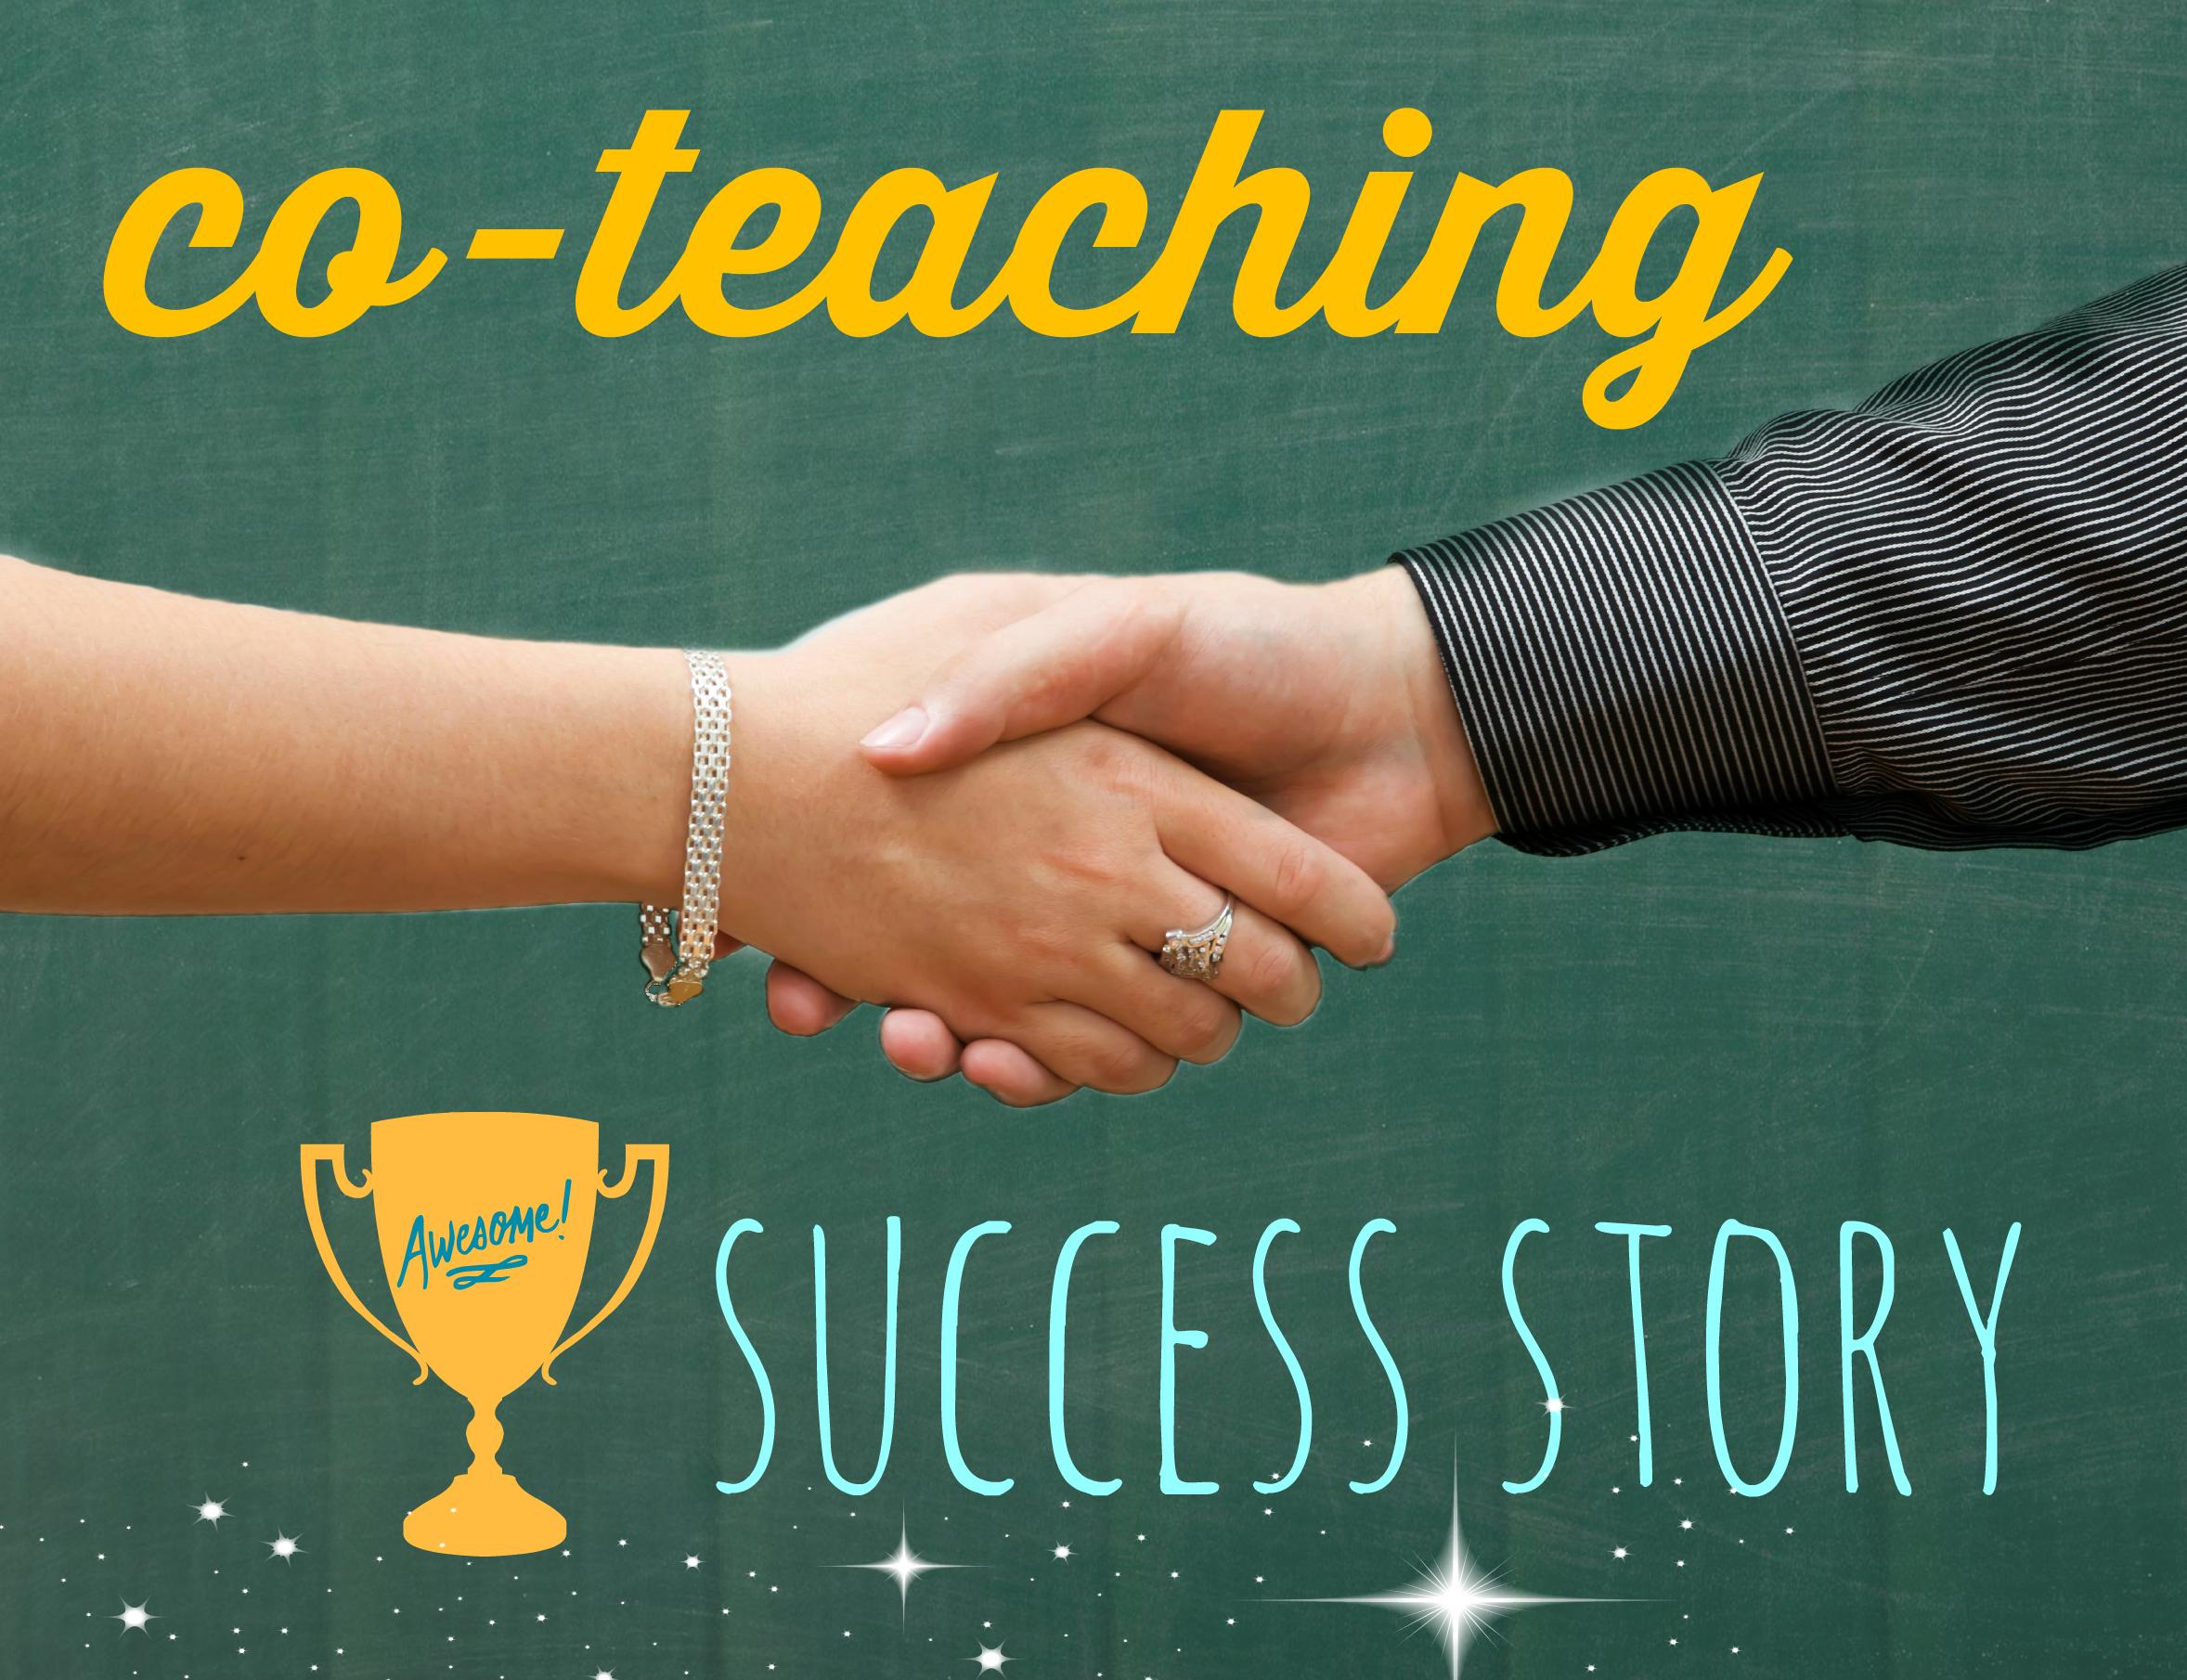 co-teaching success story